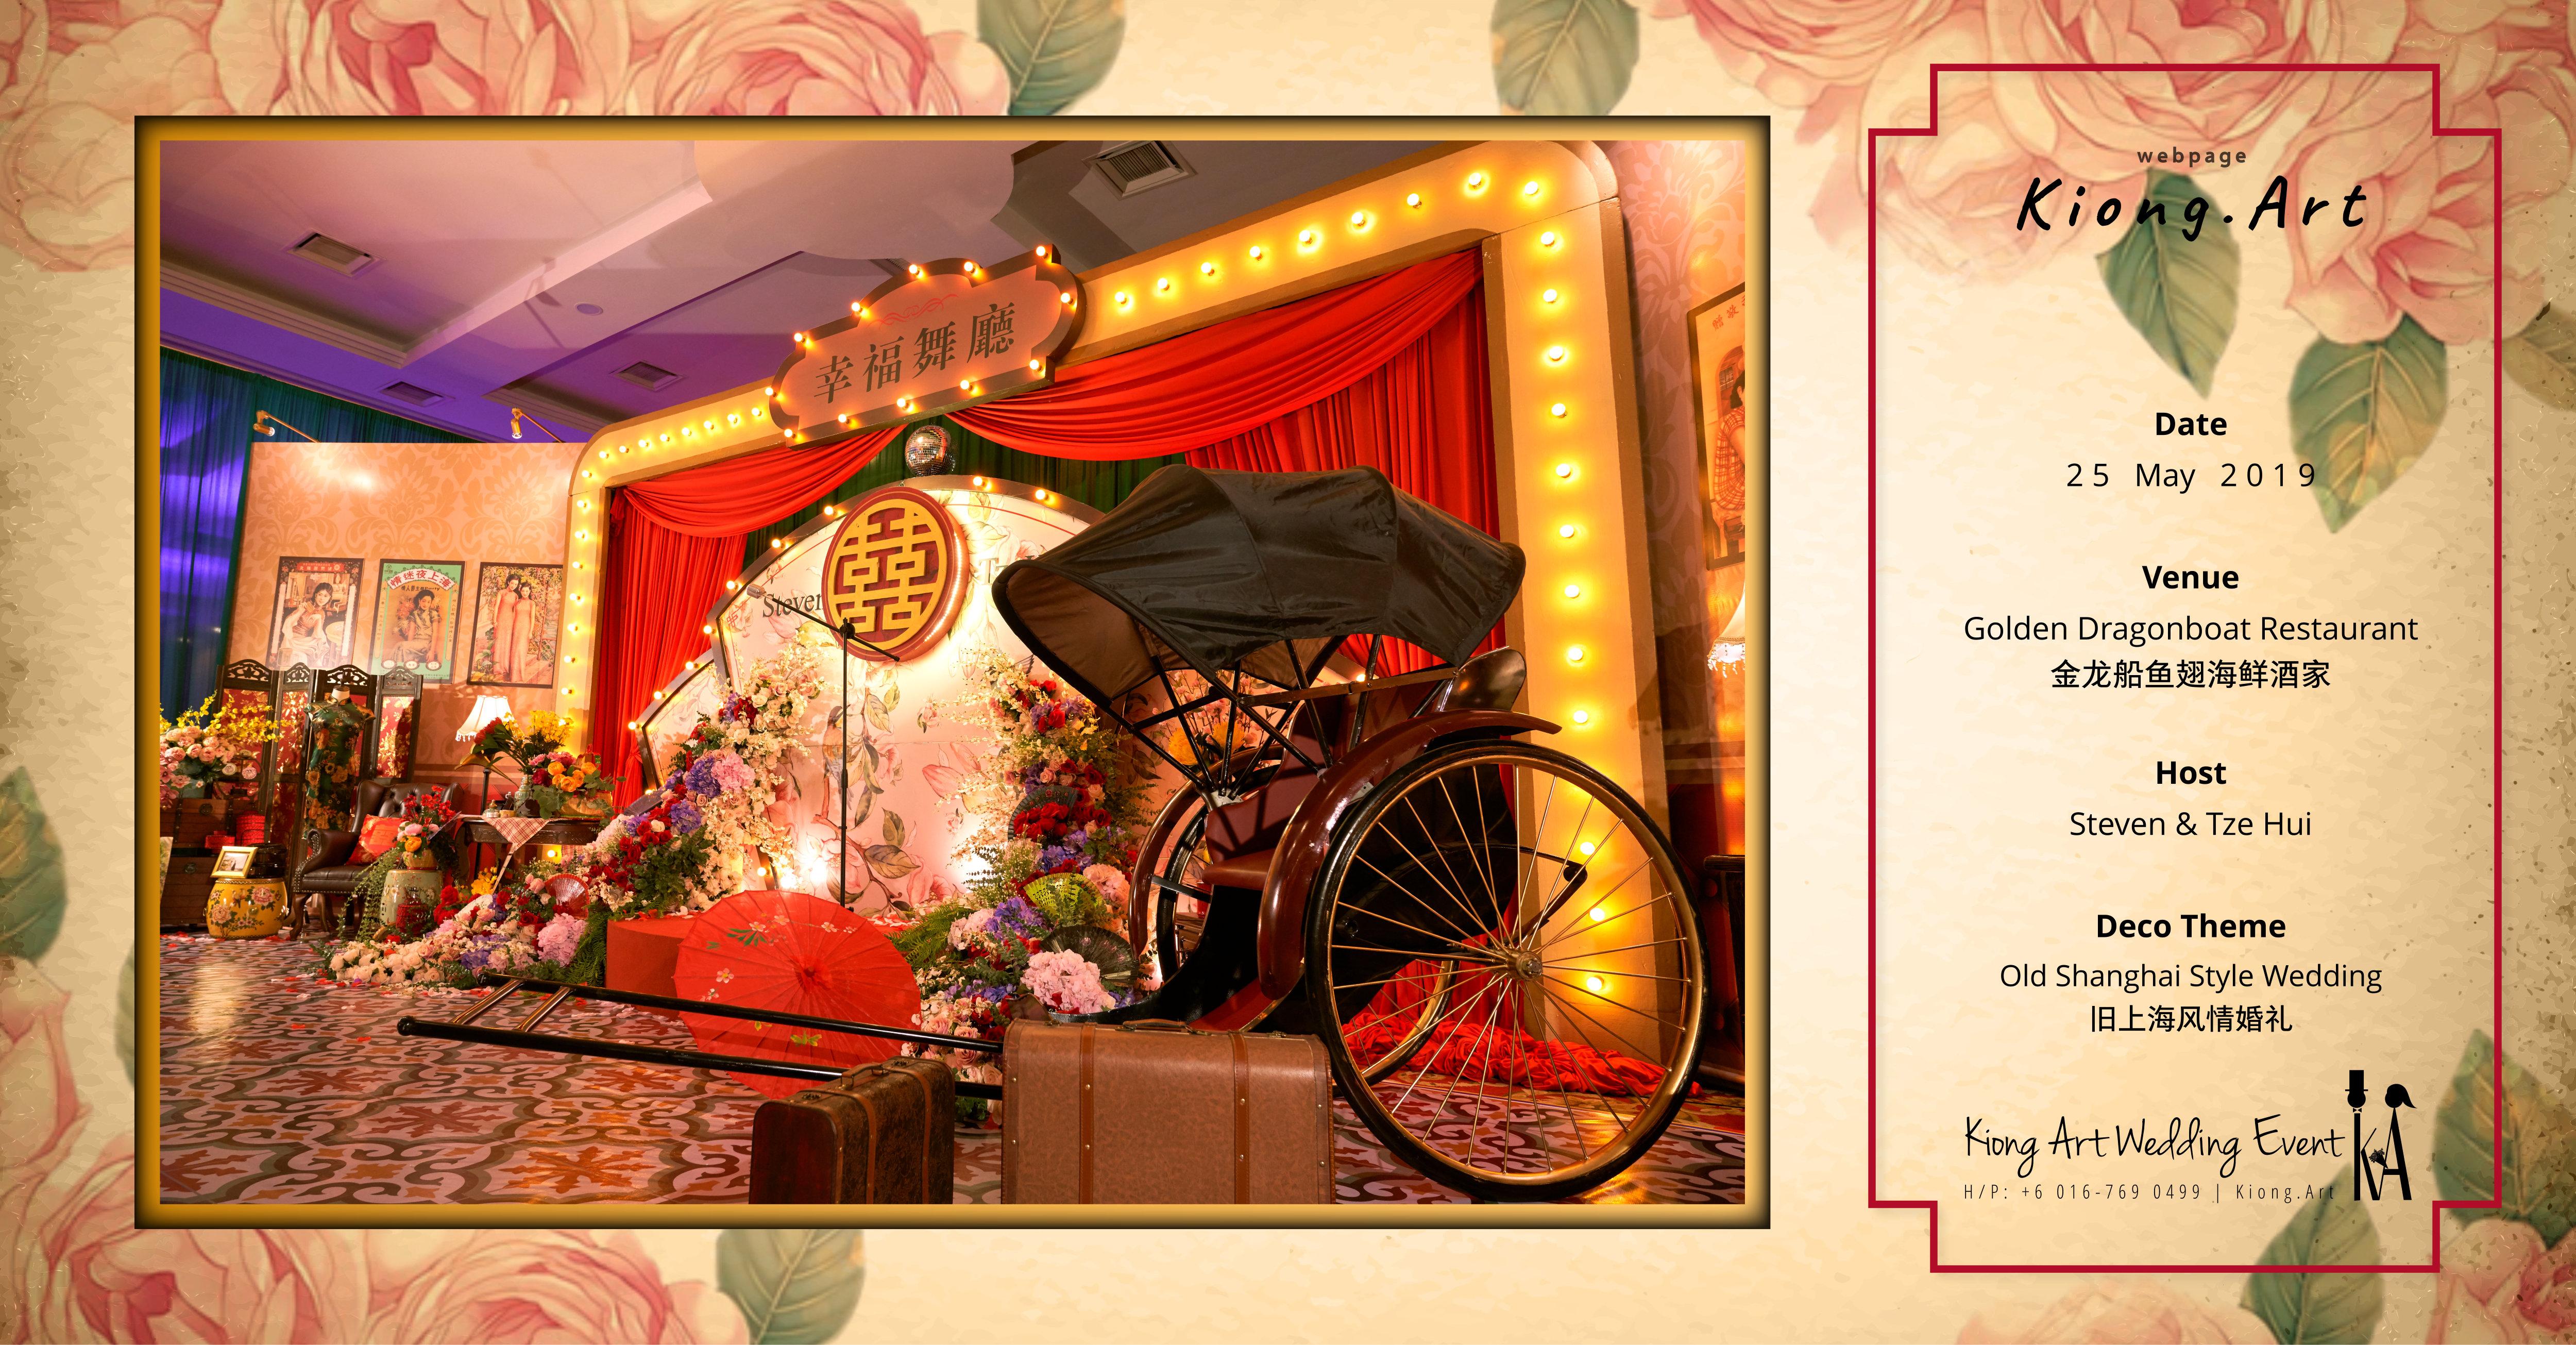 Kuala Lumpur Wedding Deco Decoration Kiong Art Wedding Deco Old Shanghai Style Wedding 旧上海风情婚礼 Steven and Tze Hui at Golden Dragonboat Restaurant 金龙船鱼翅海鲜酒家 Malaysia A16-B00-007